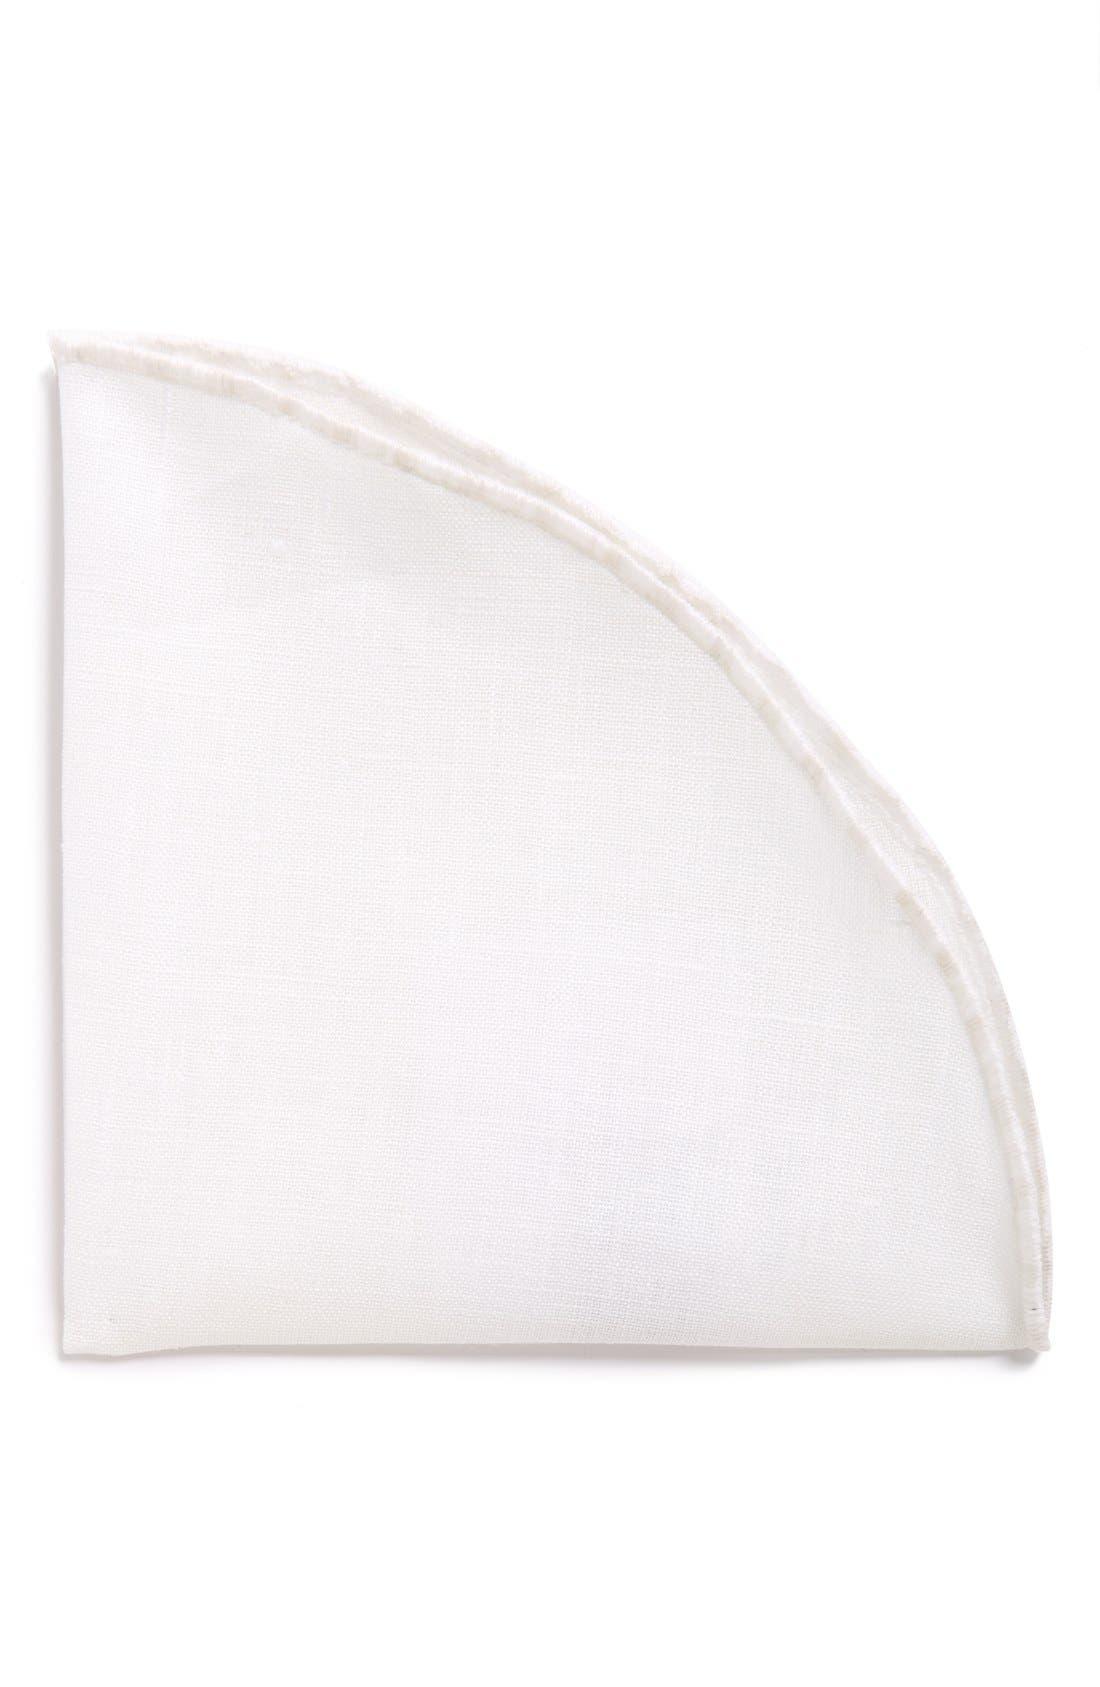 Linen Pocket Round,                             Main thumbnail 1, color,                             100